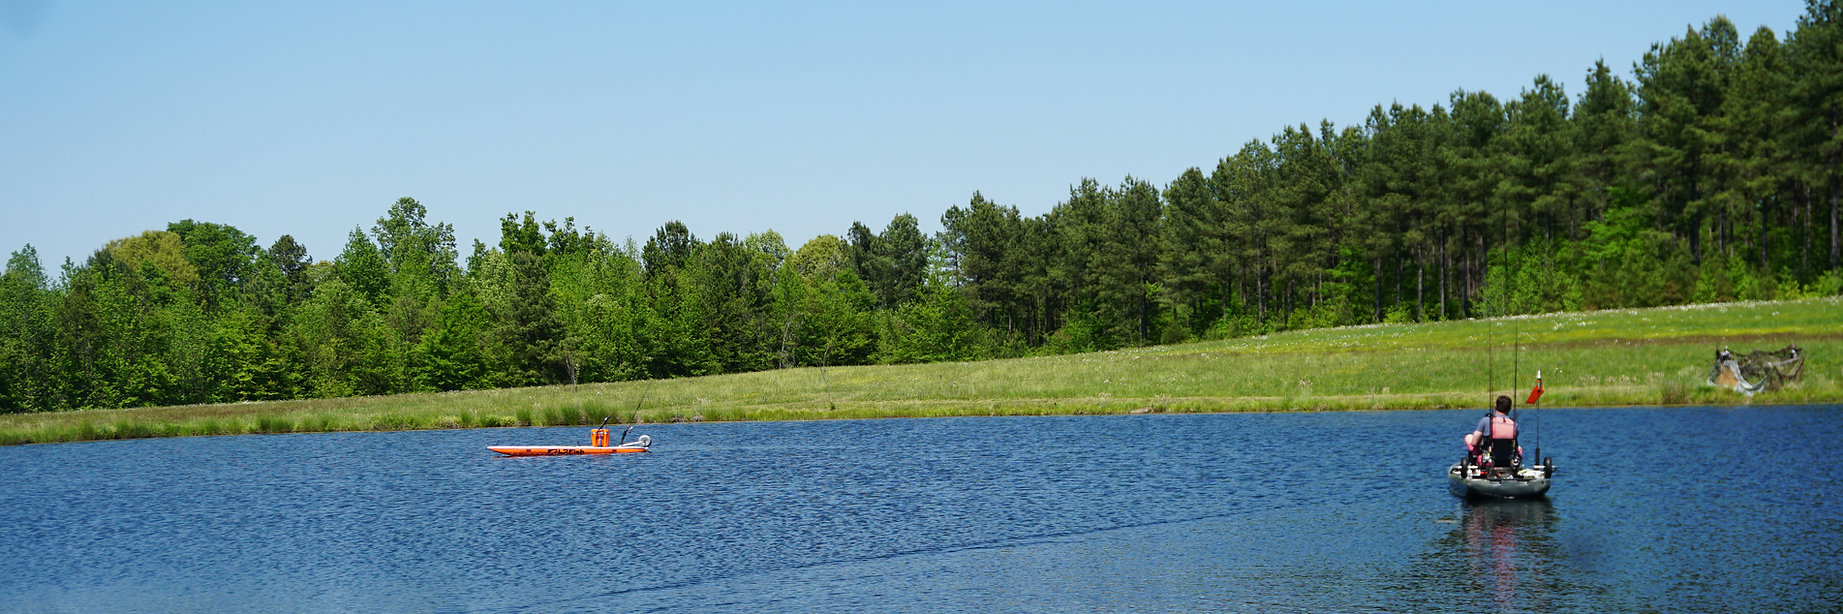 lake_1900x633.jpg